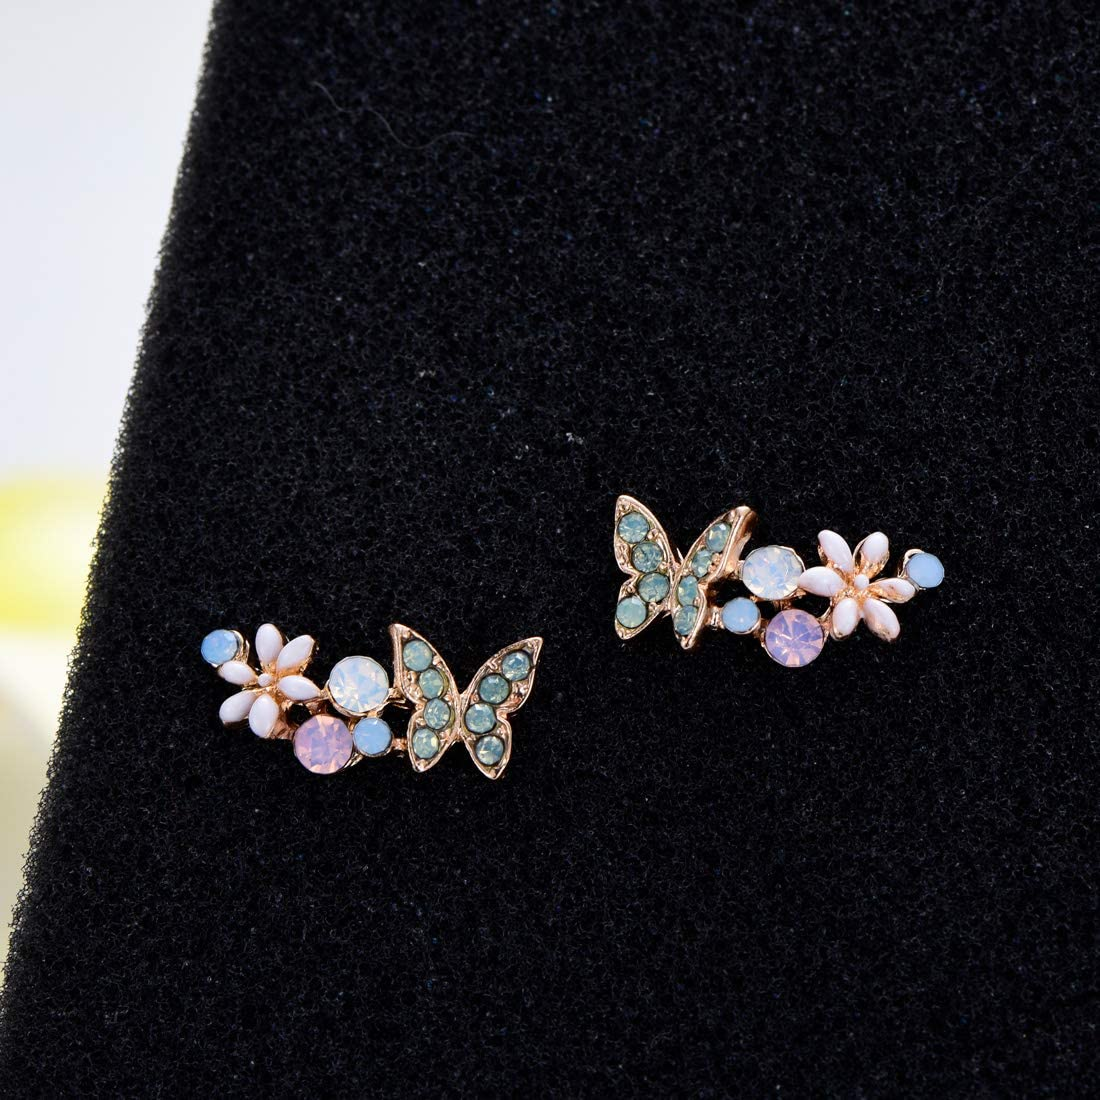 YOQUCOL Clear AB Multiple Colors Austrian Crystal Butterfly Climber Cute Earrings Ear Vine Wrap For Women Girls